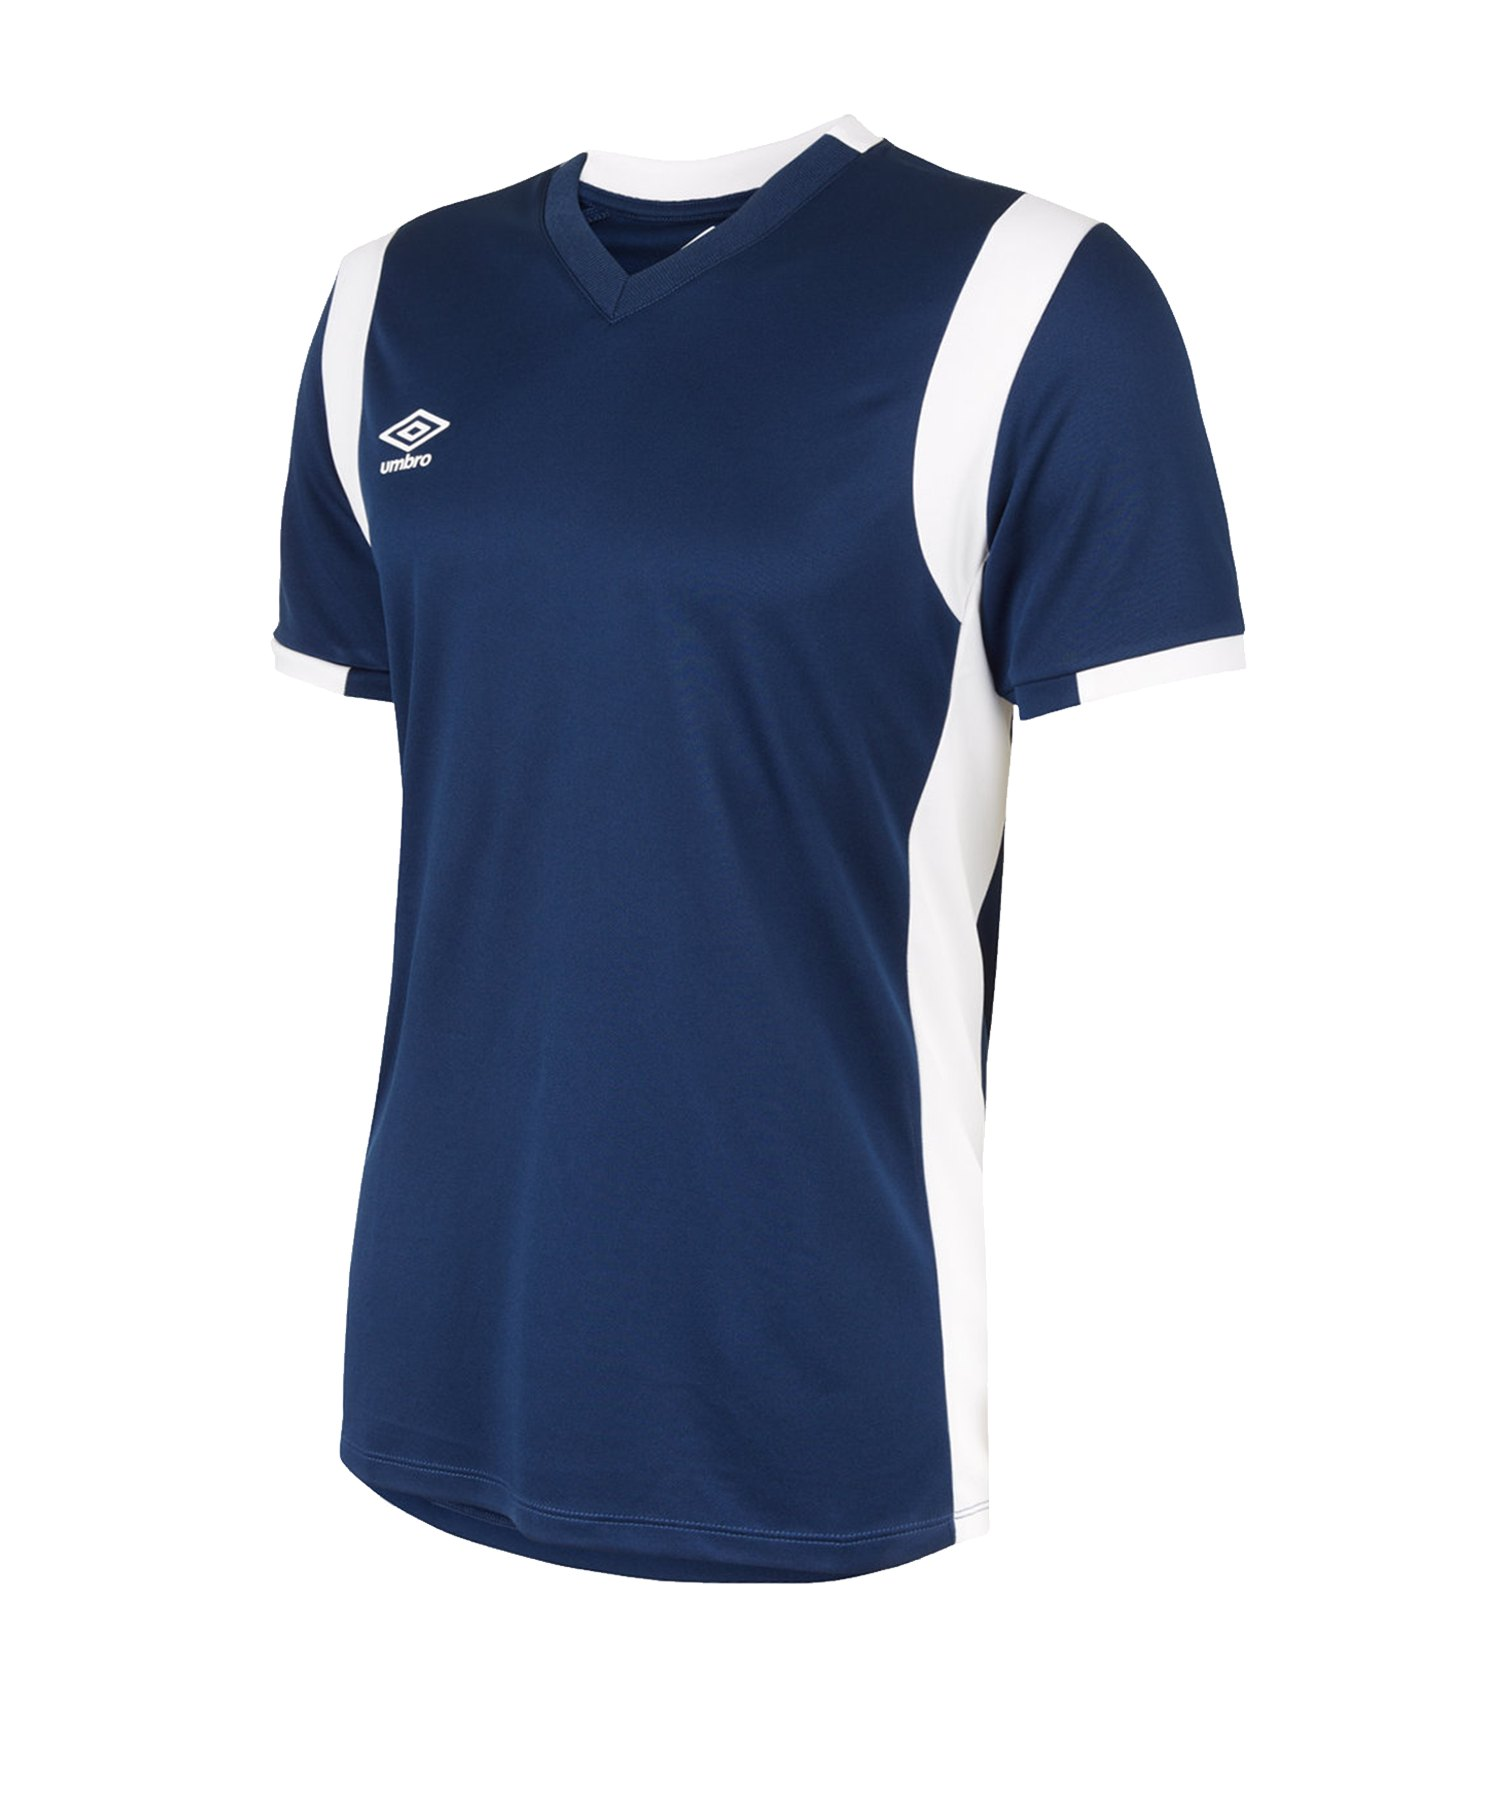 Umbro Spartan T-Shirt Blau FNW - Blau